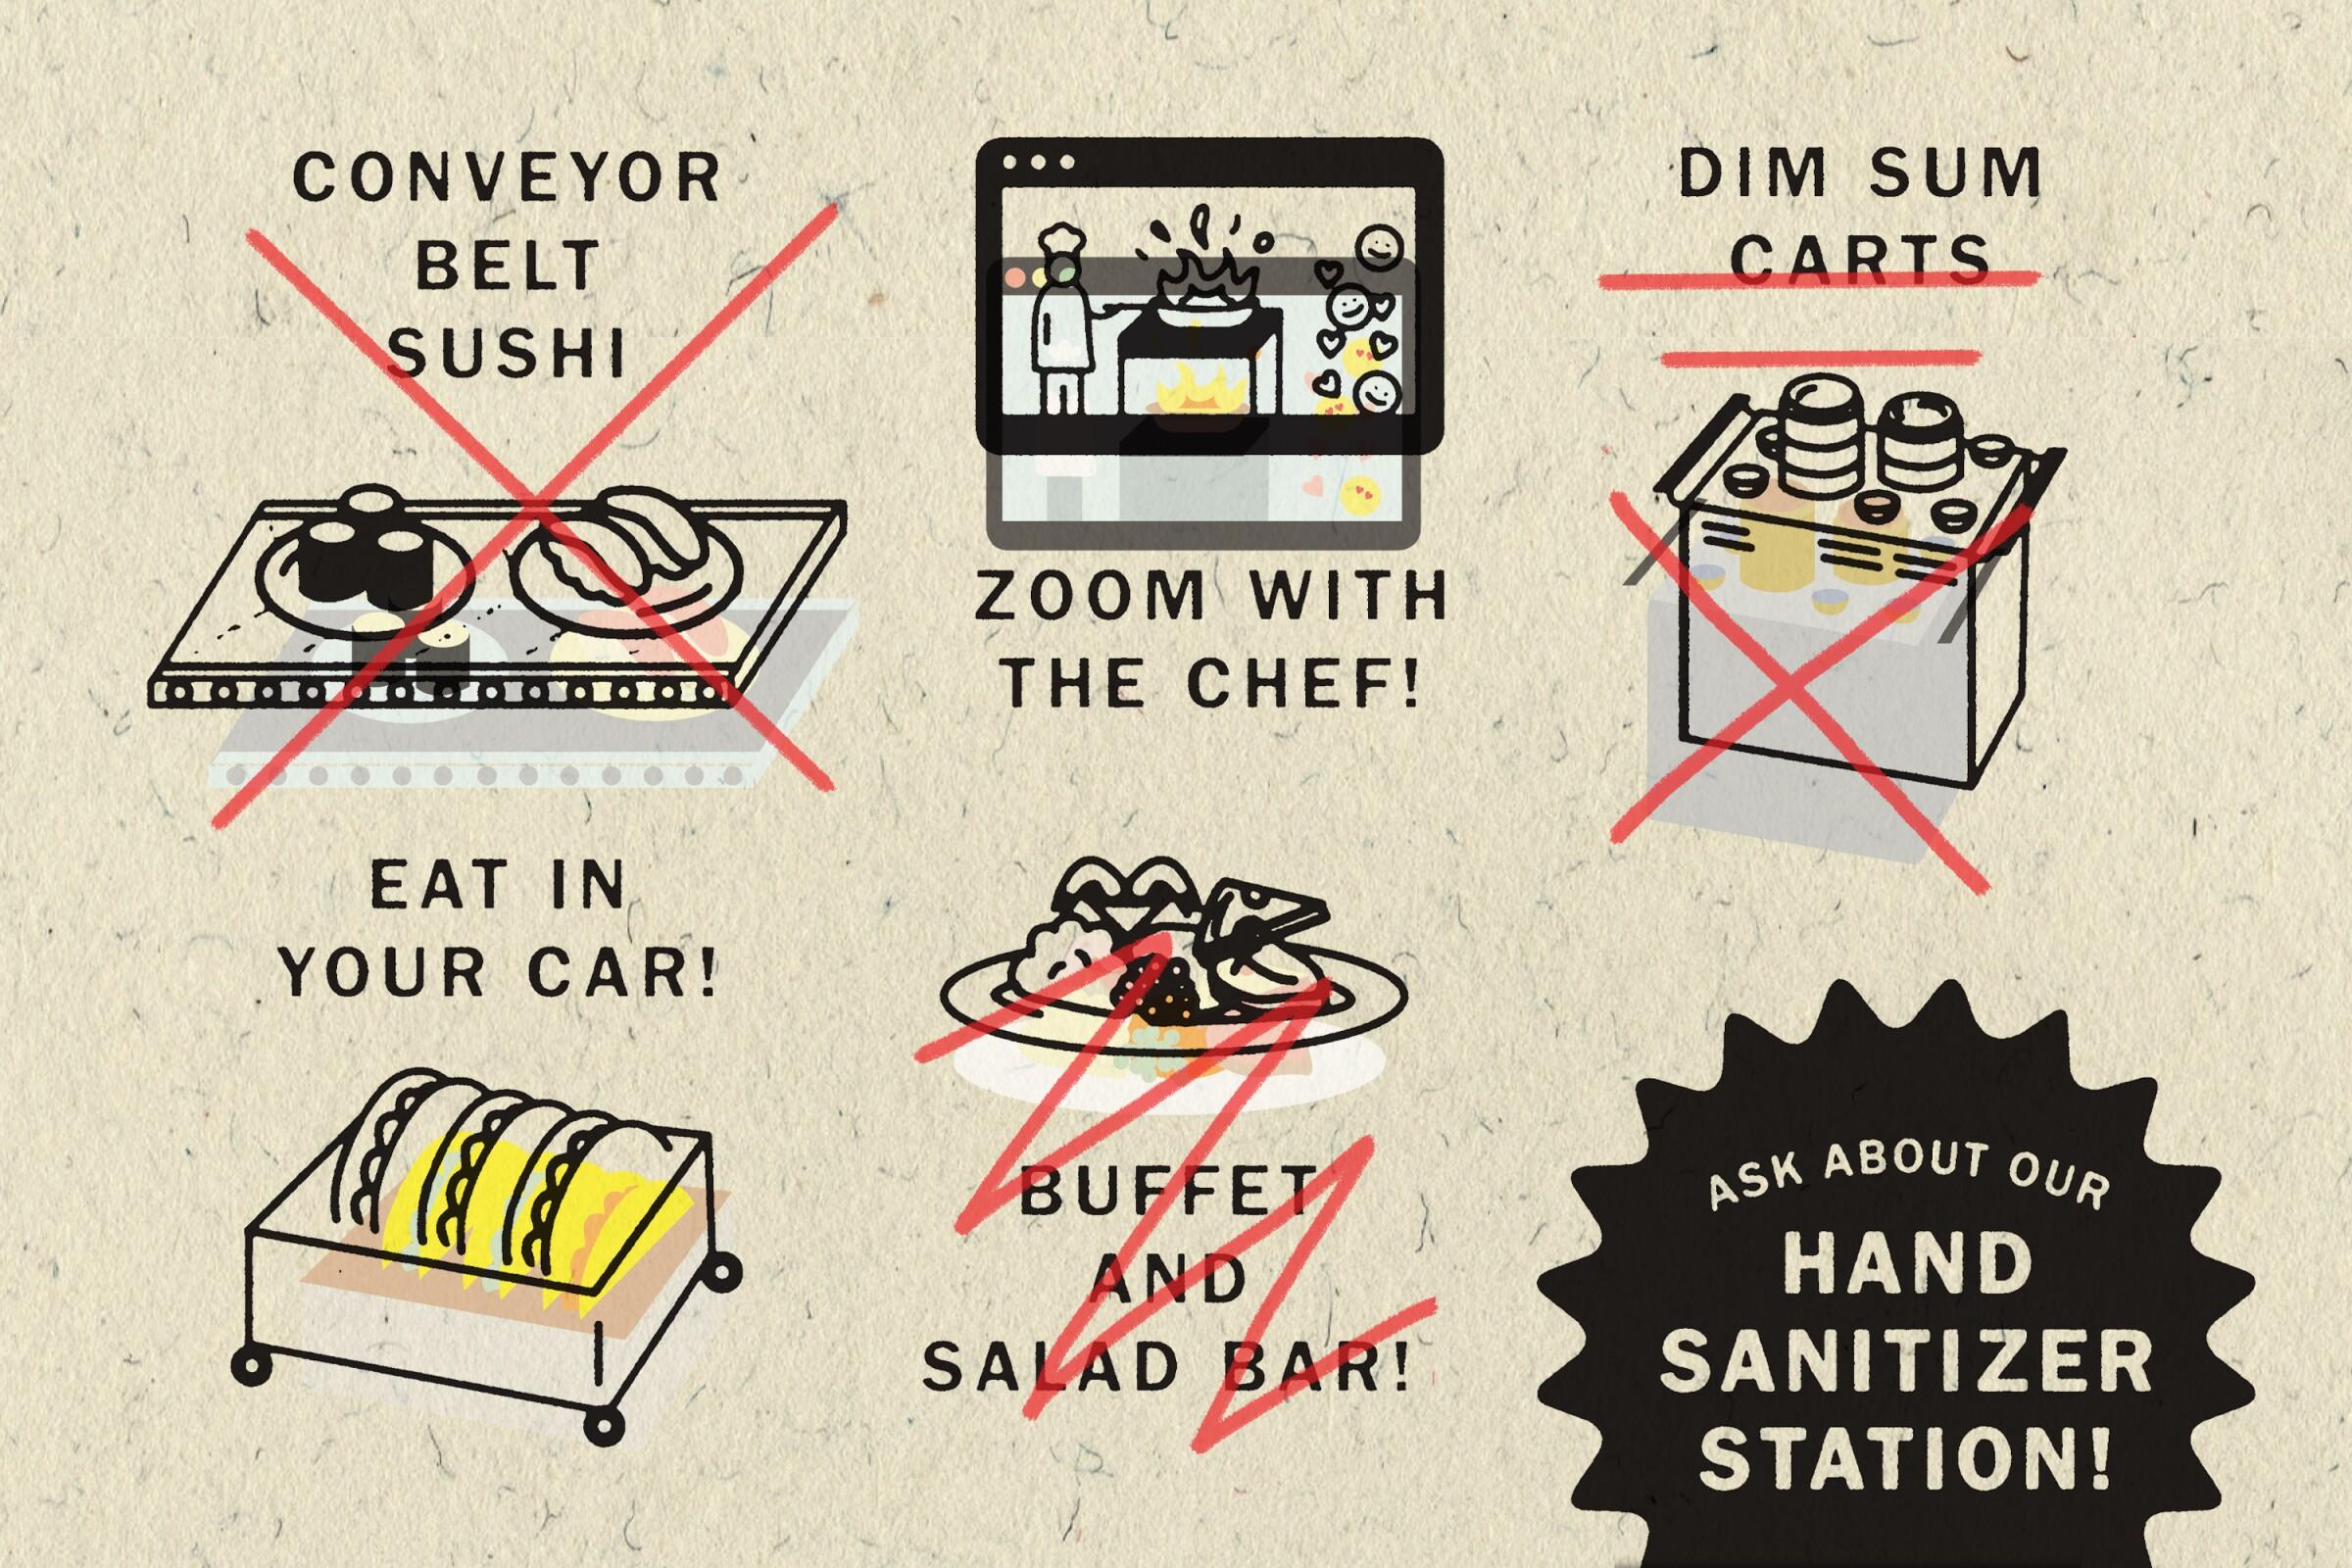 Illustrations of sushi conveyor belt, dim sum cart, buffet and salad bar